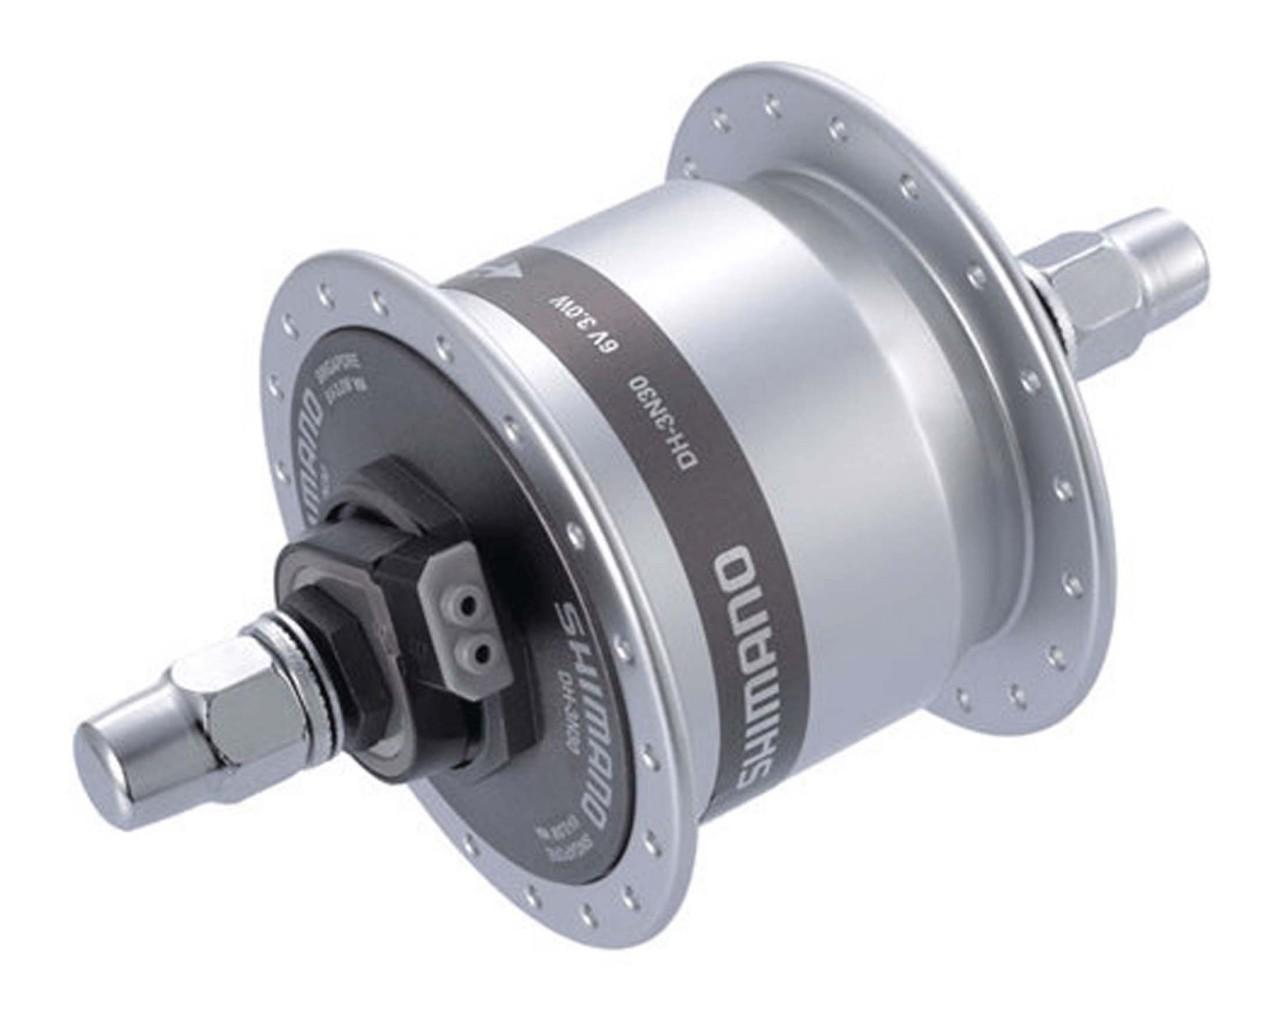 Shimano Dynamoeinheit DH-3N30 Innenmontage 140 mm | silber